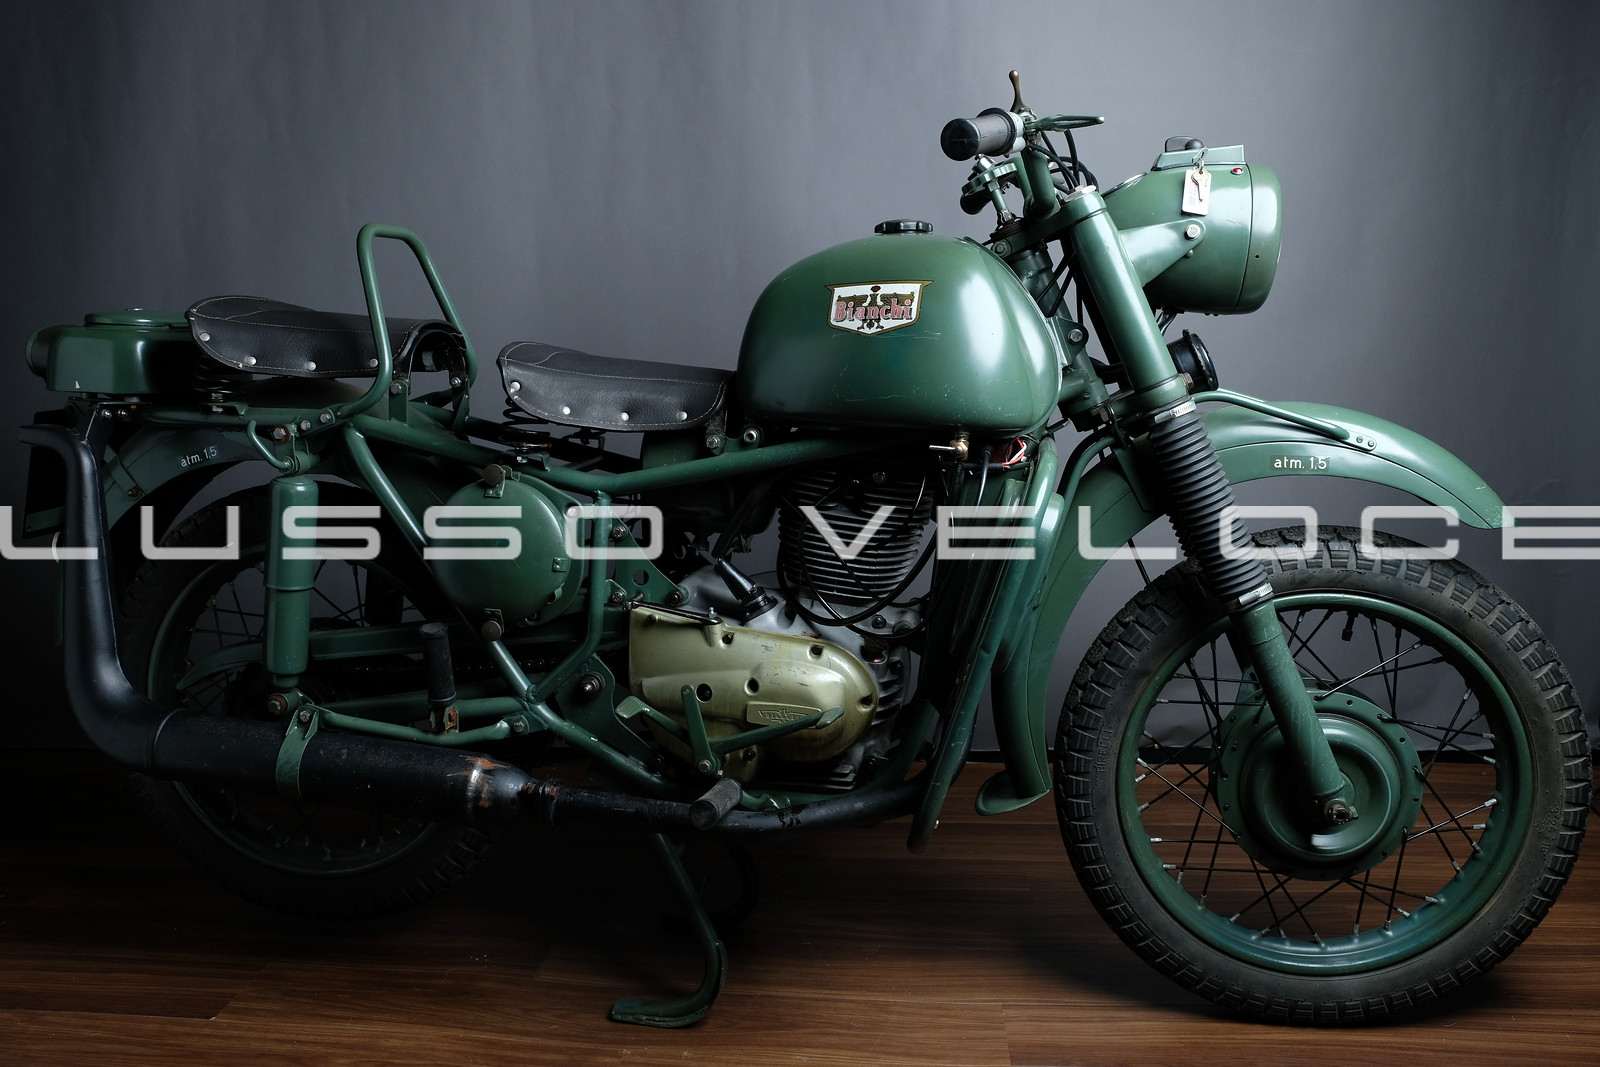 Bianchi MT61 Military